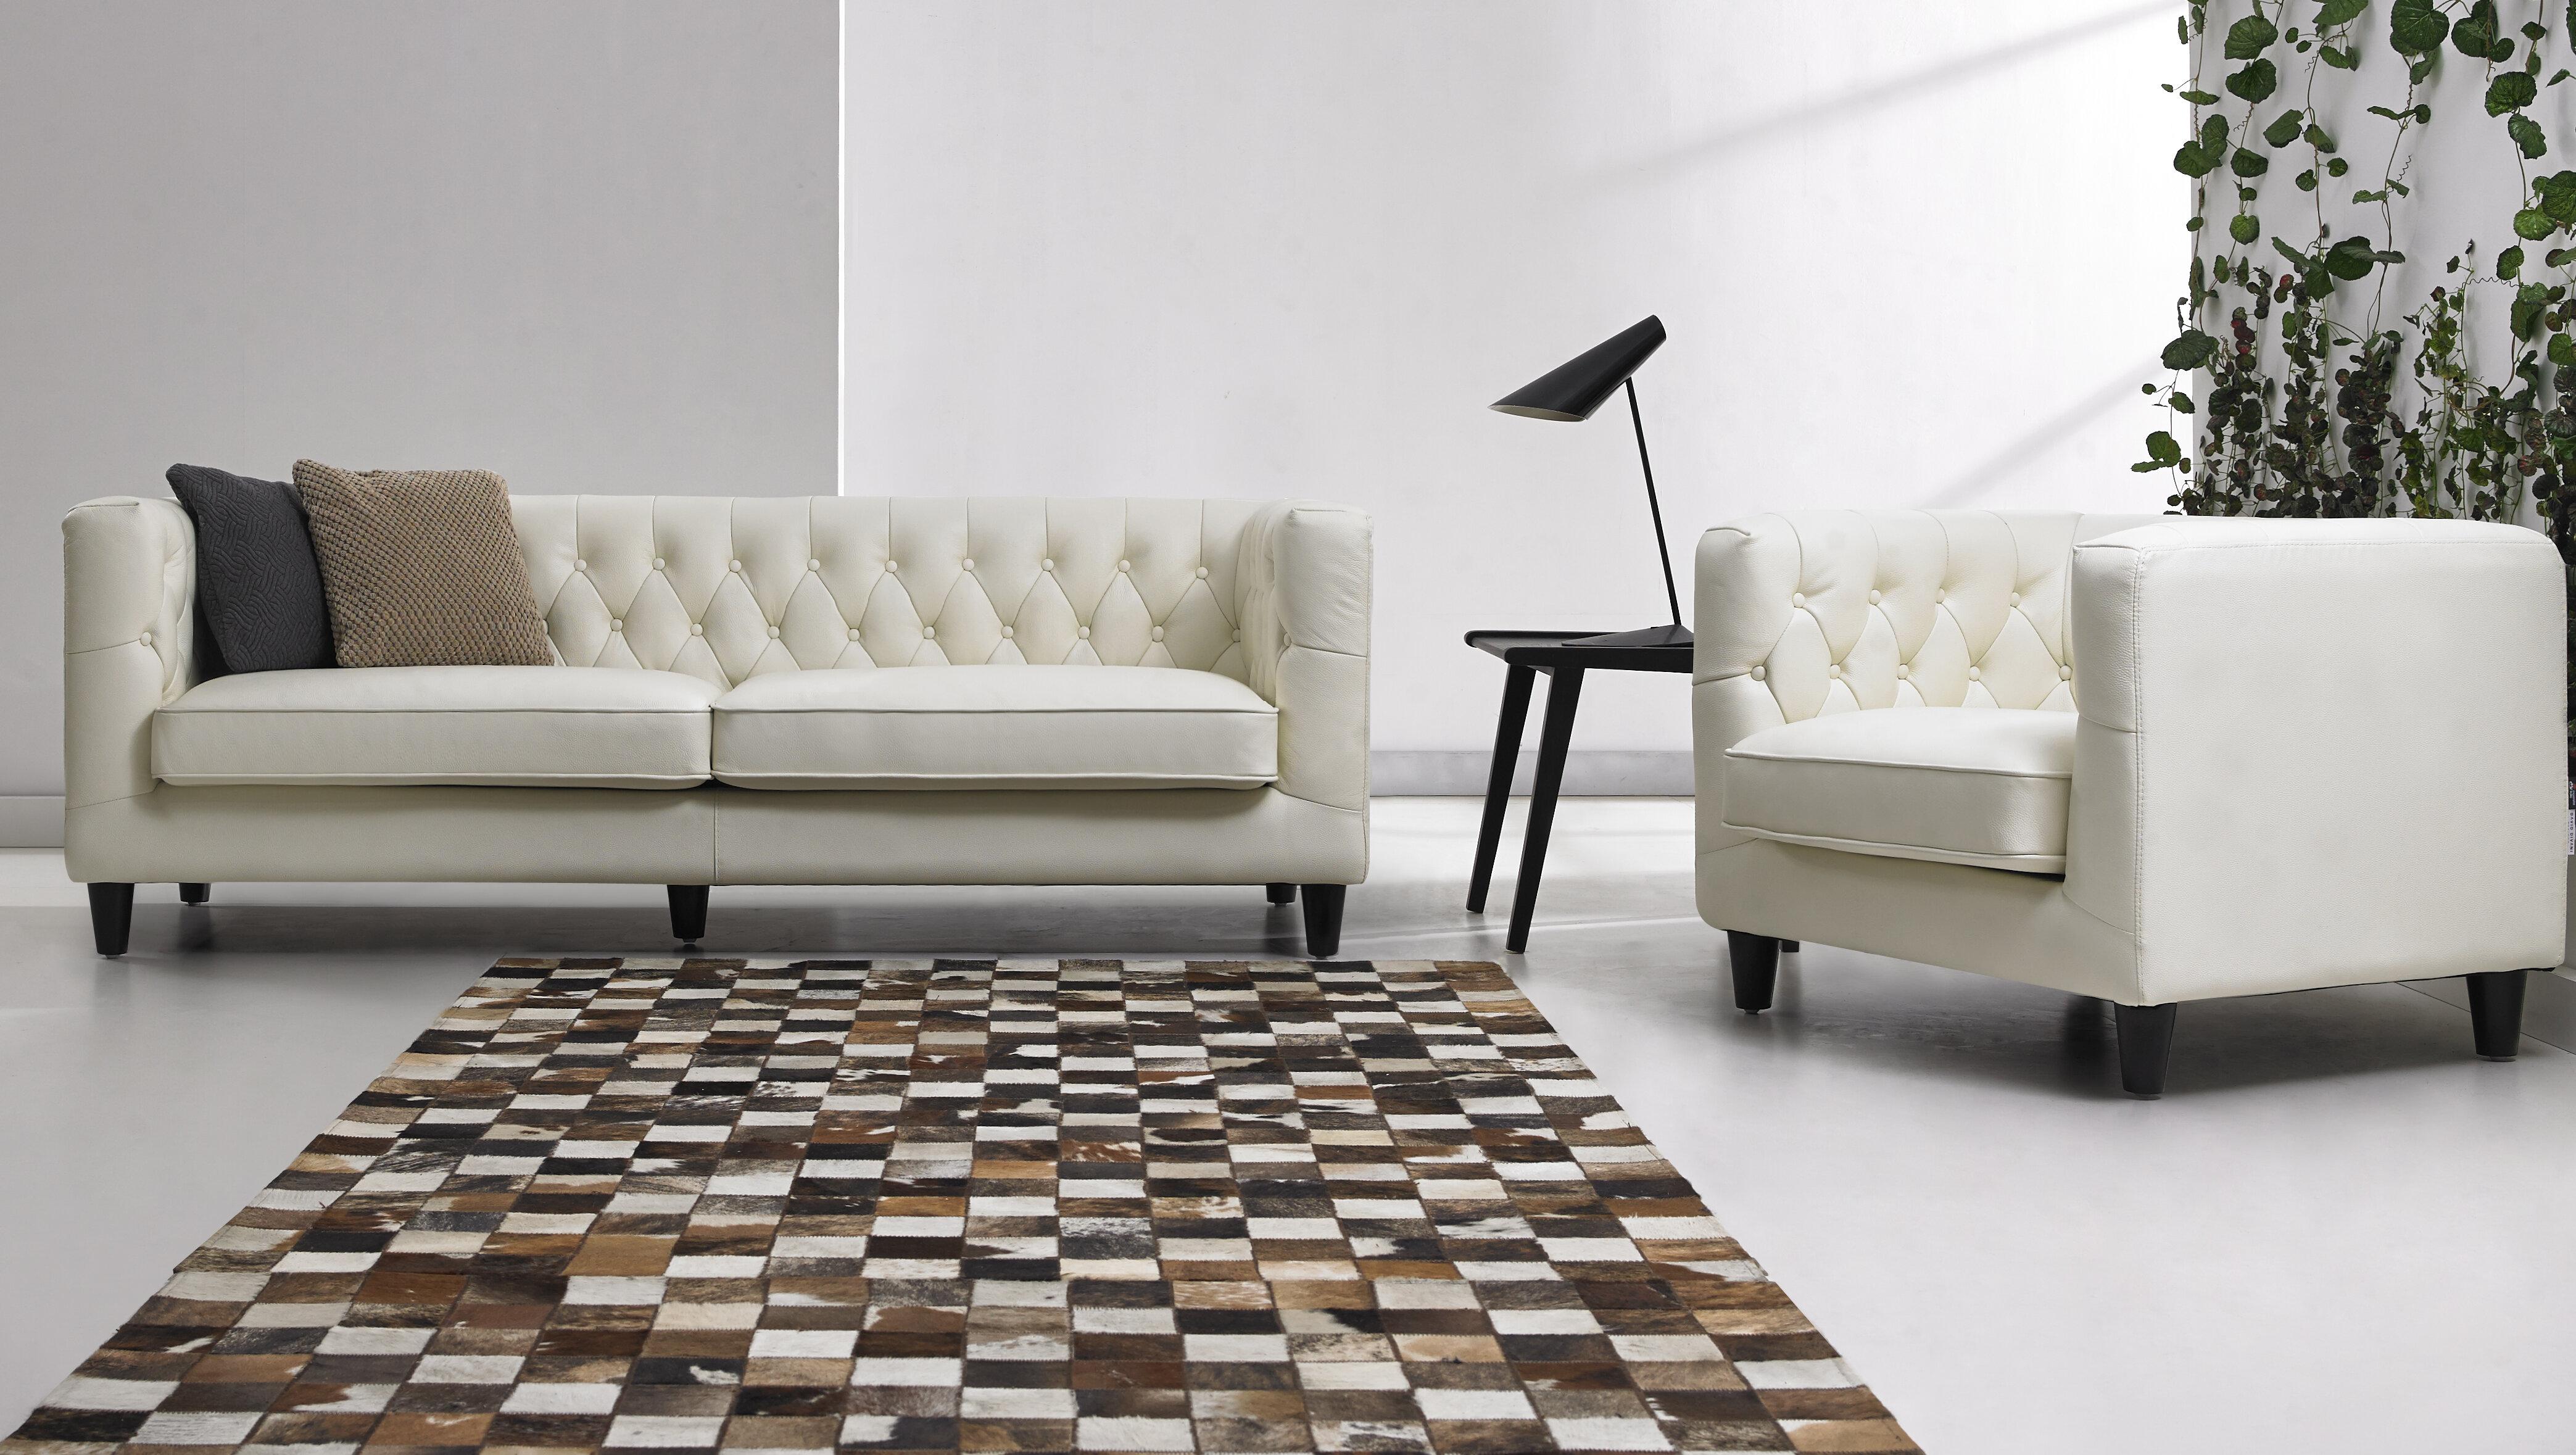 DavidDivaniDesigns 2 Piece Leather Living Room Set | Wayfair